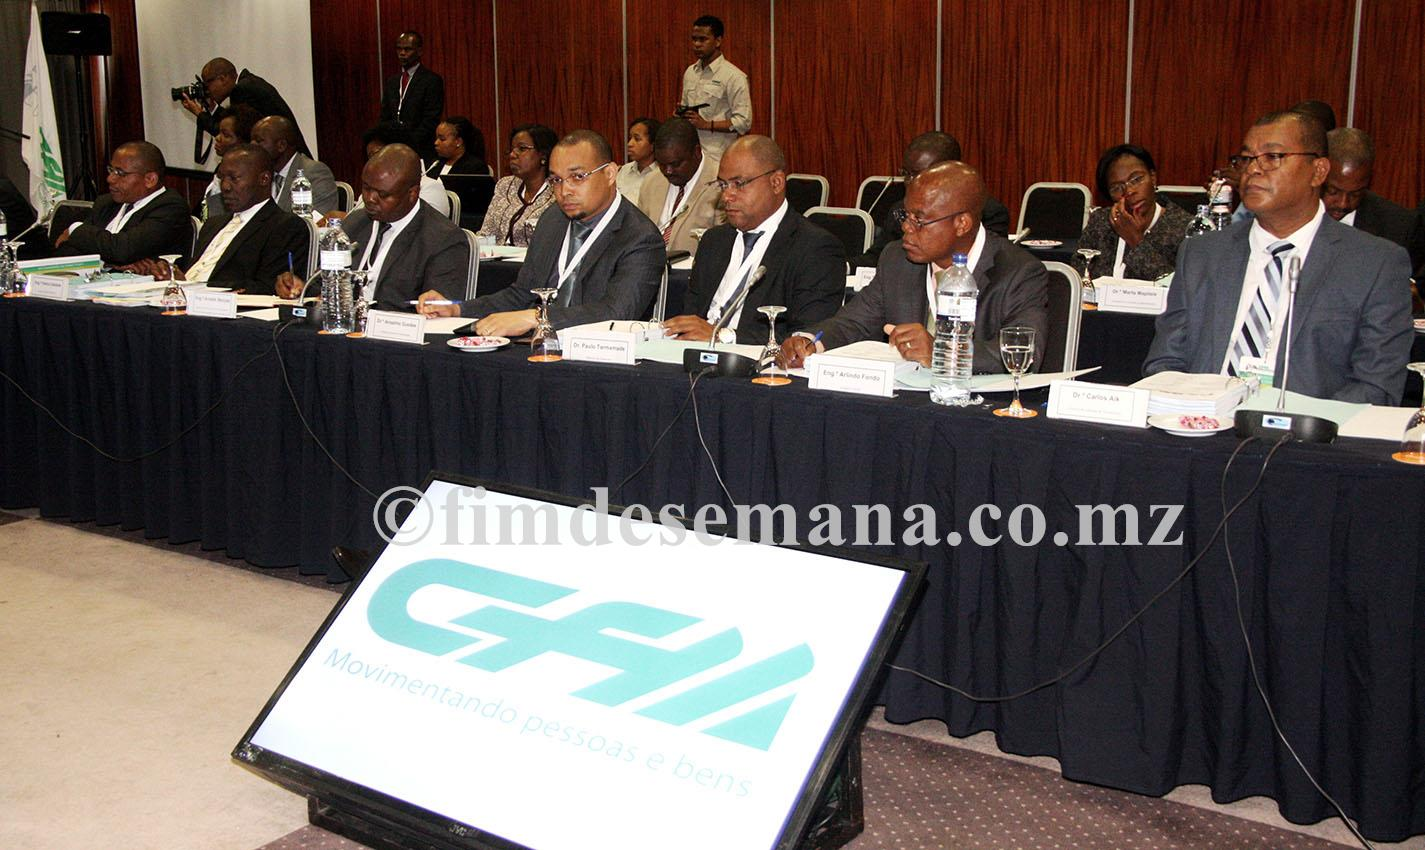 Participantes no XX Conselho de Directores da empresa CFM